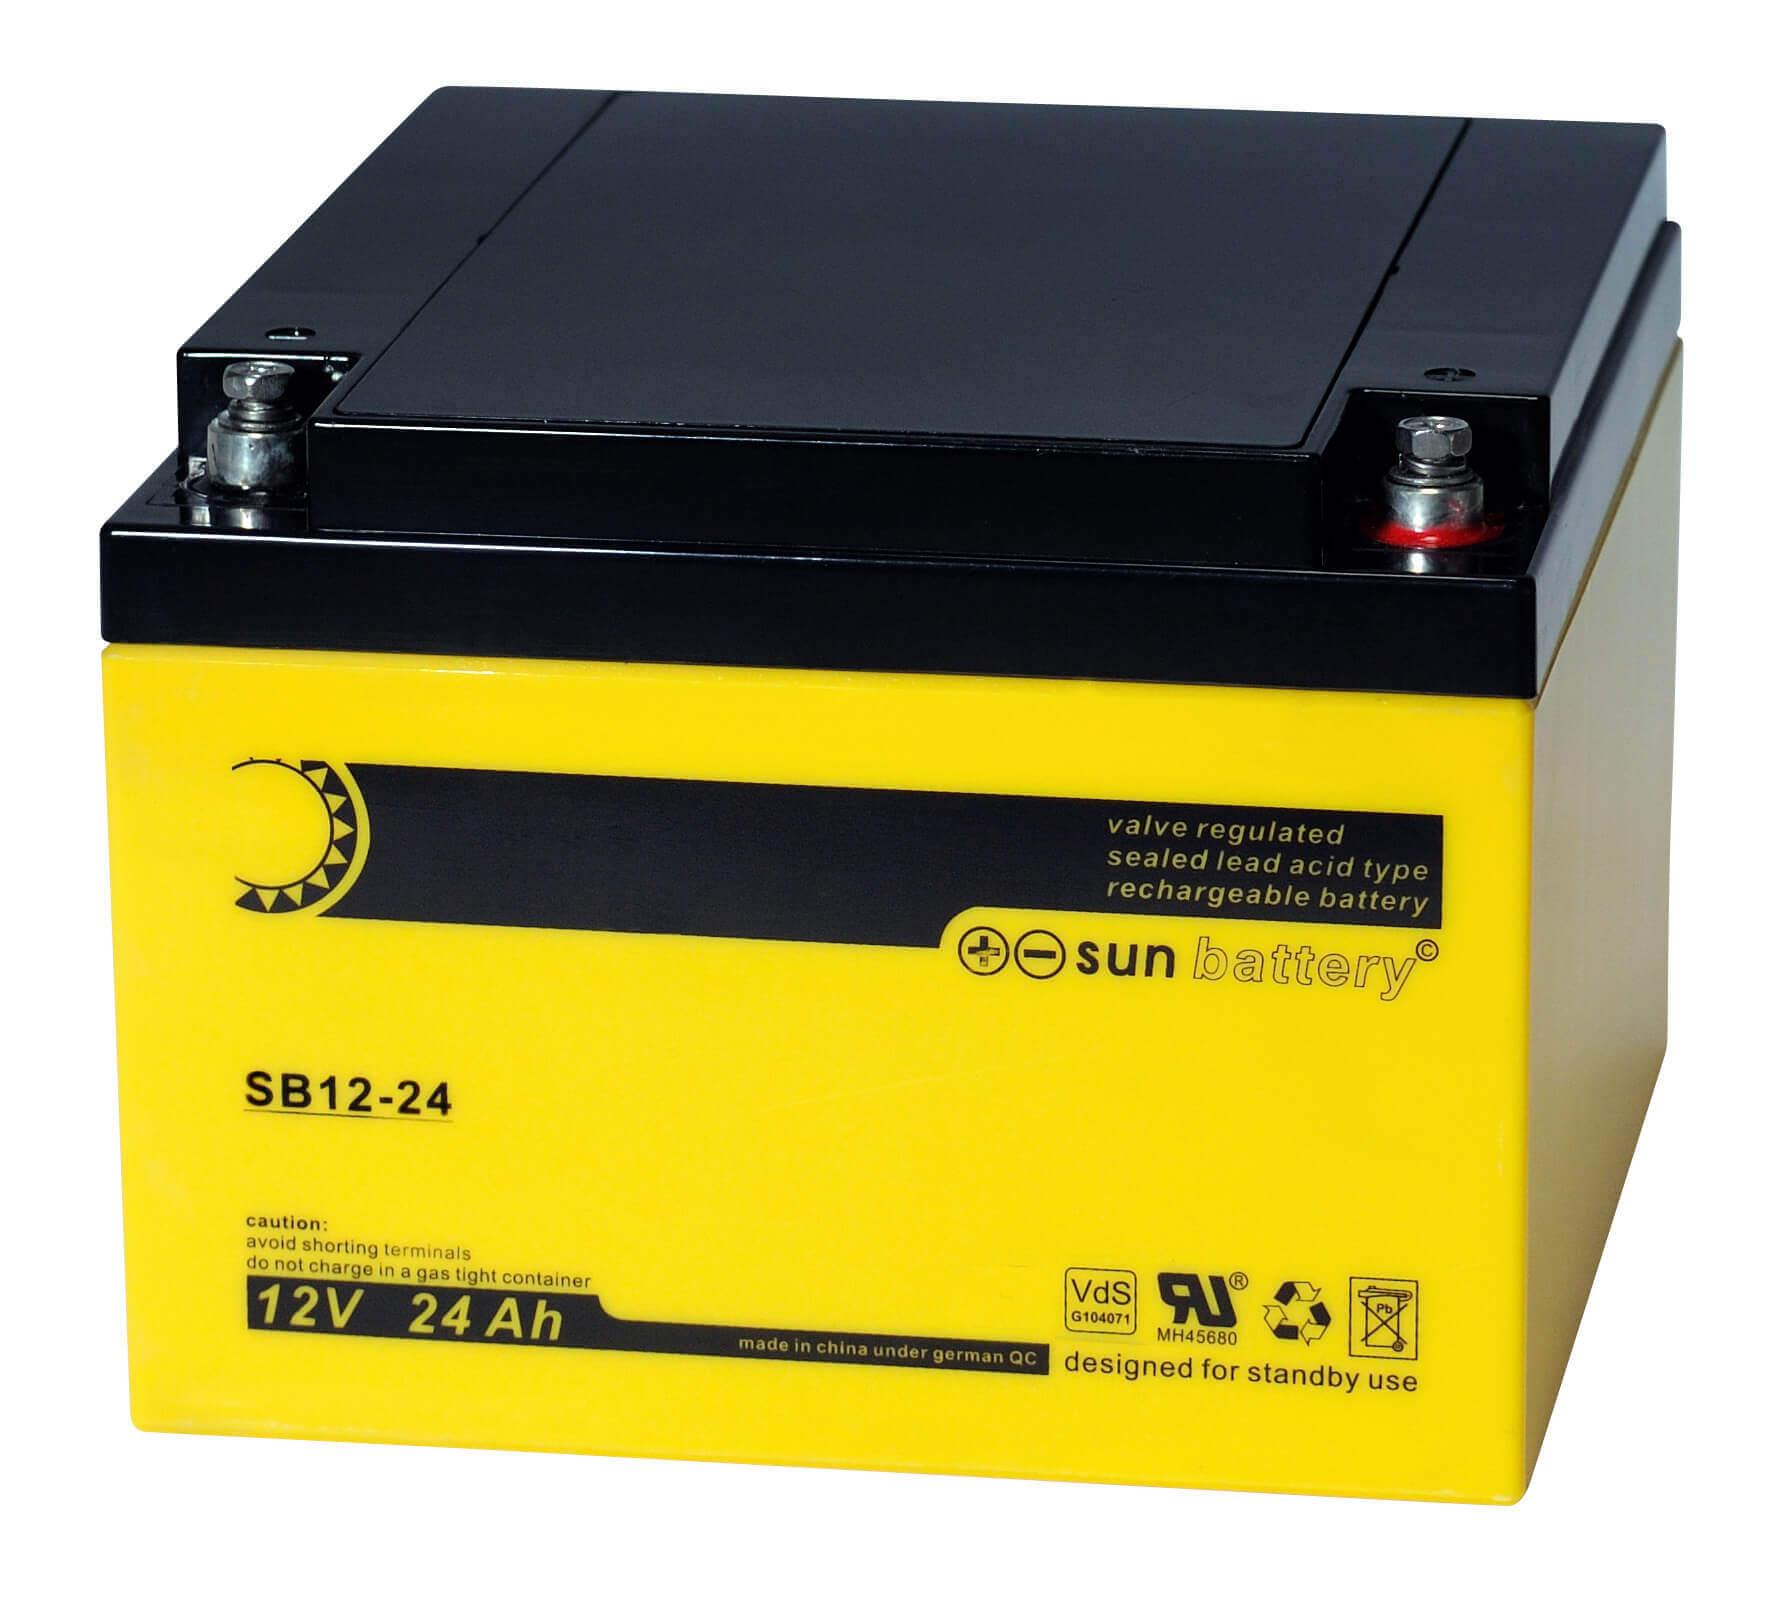 Sun Battery SB12-24 12V 26Ah Bleiakku